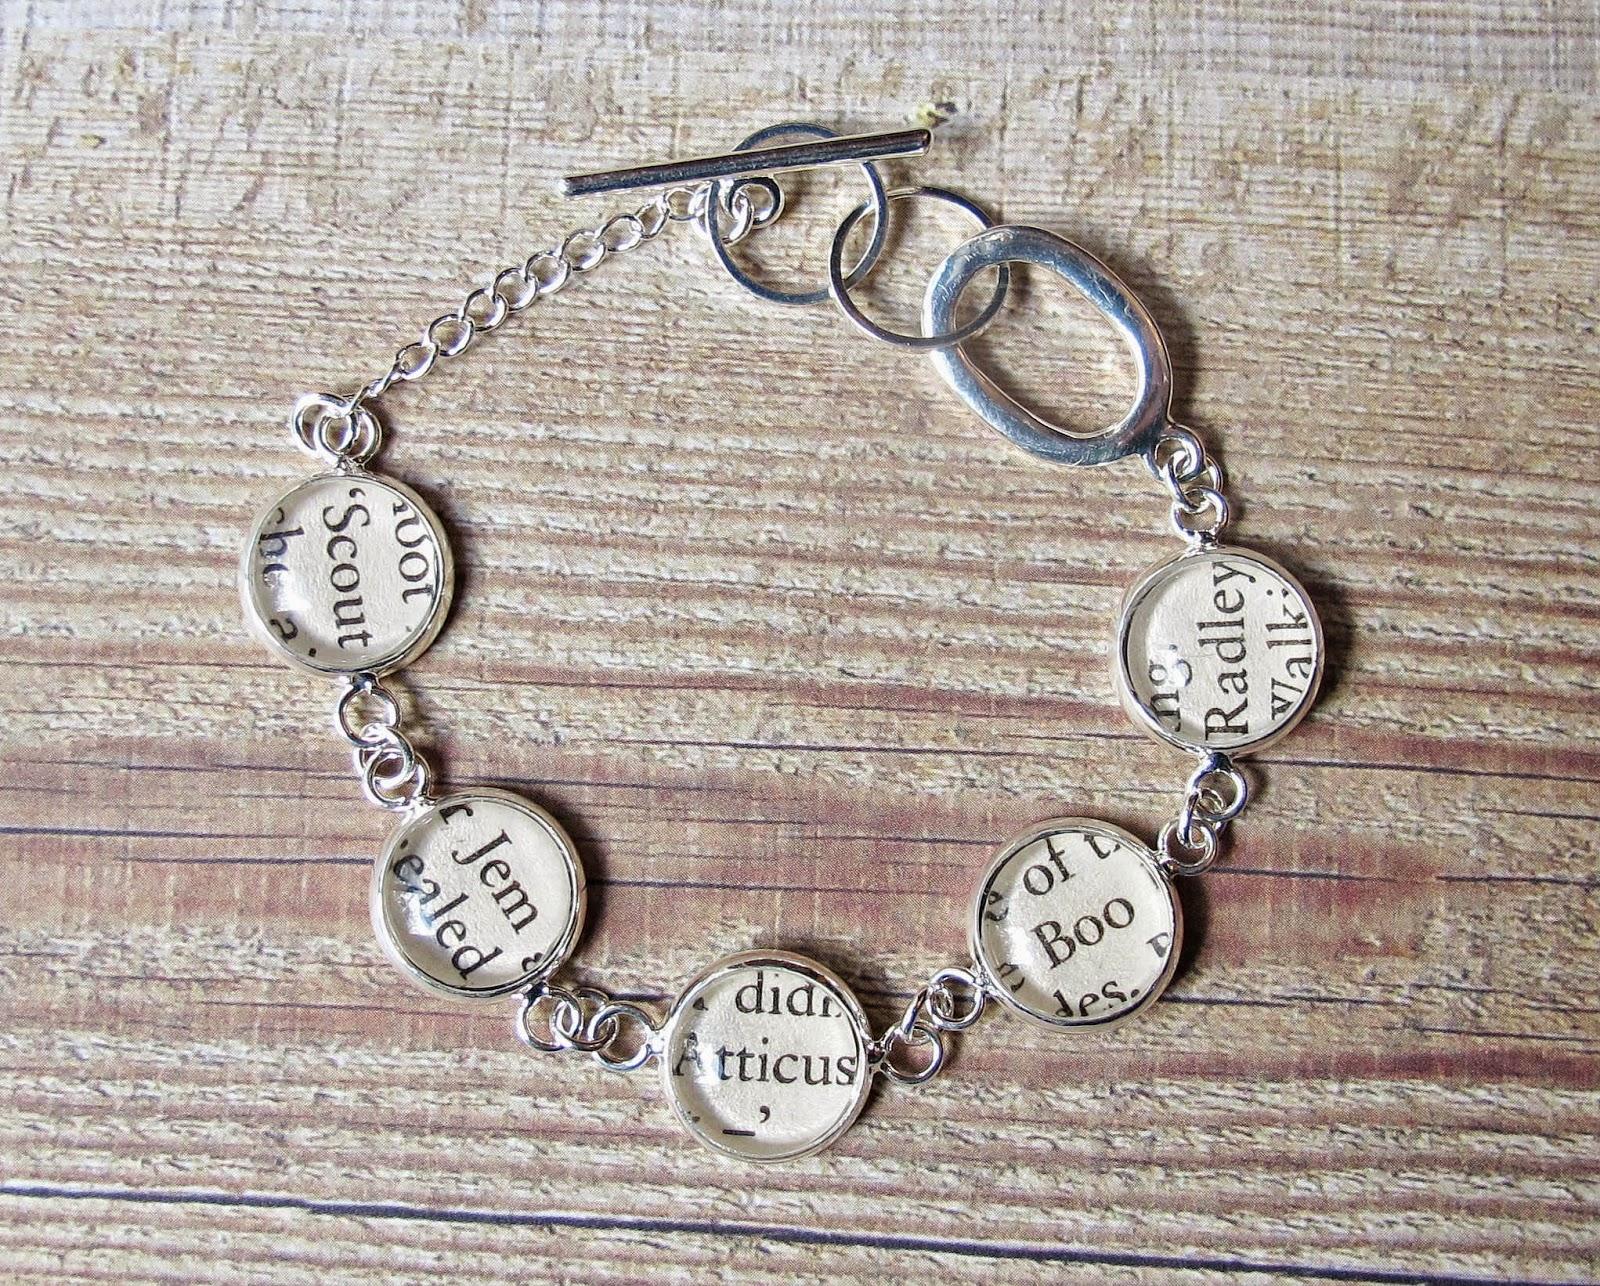 image two cheeky monkeys bracelet literature jewellery jewelry to kill a mockingbird atticus finch boo radley harper lee